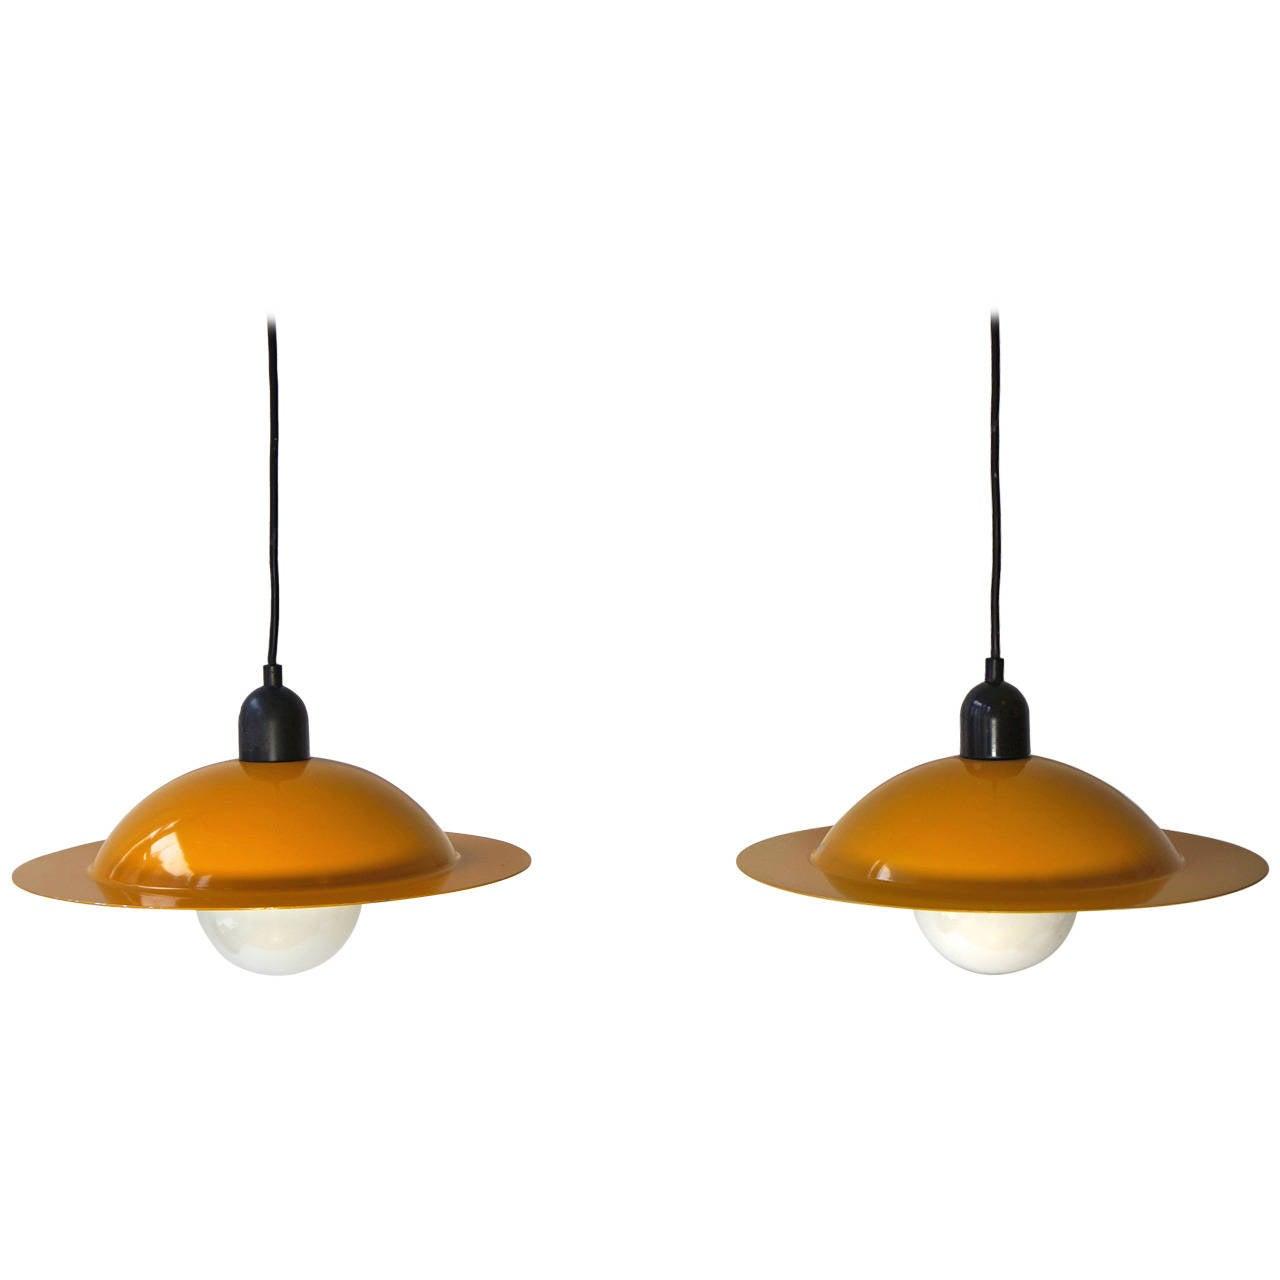 Pair Of Italian Ceiling Lights